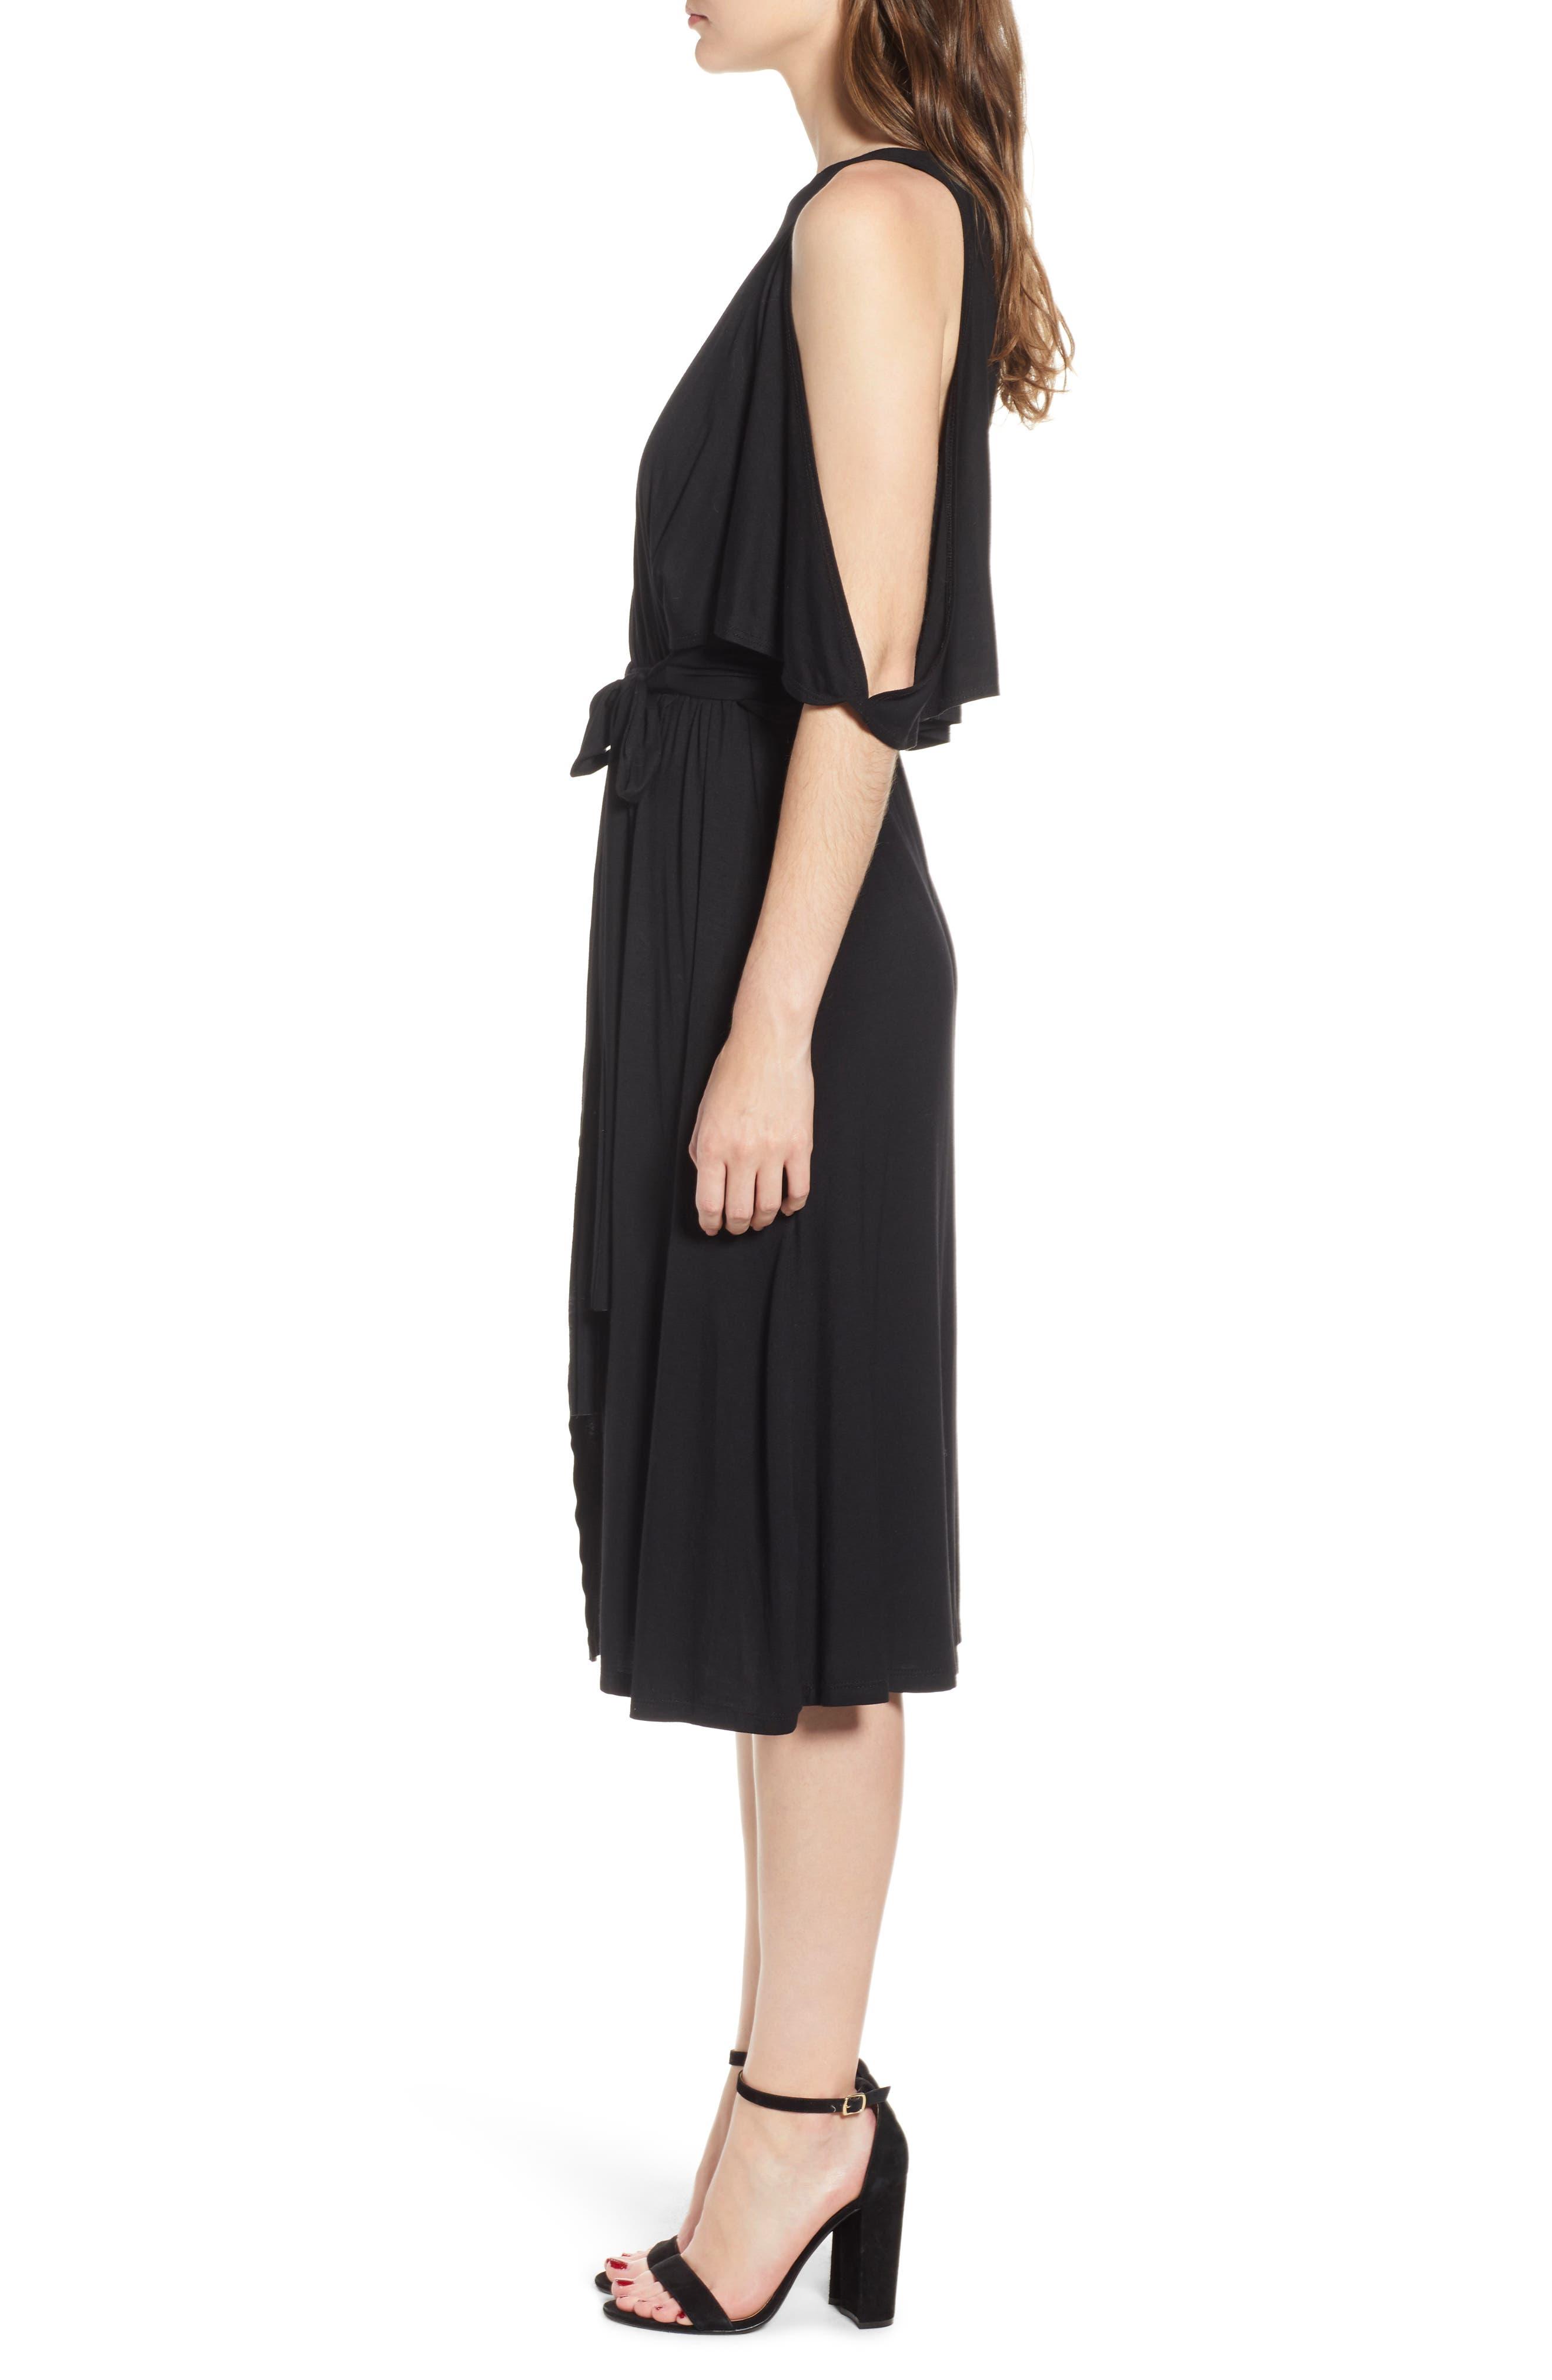 Bishop + Young Slit Sleeve Wrap Style Dress,                             Alternate thumbnail 5, color,                             Black